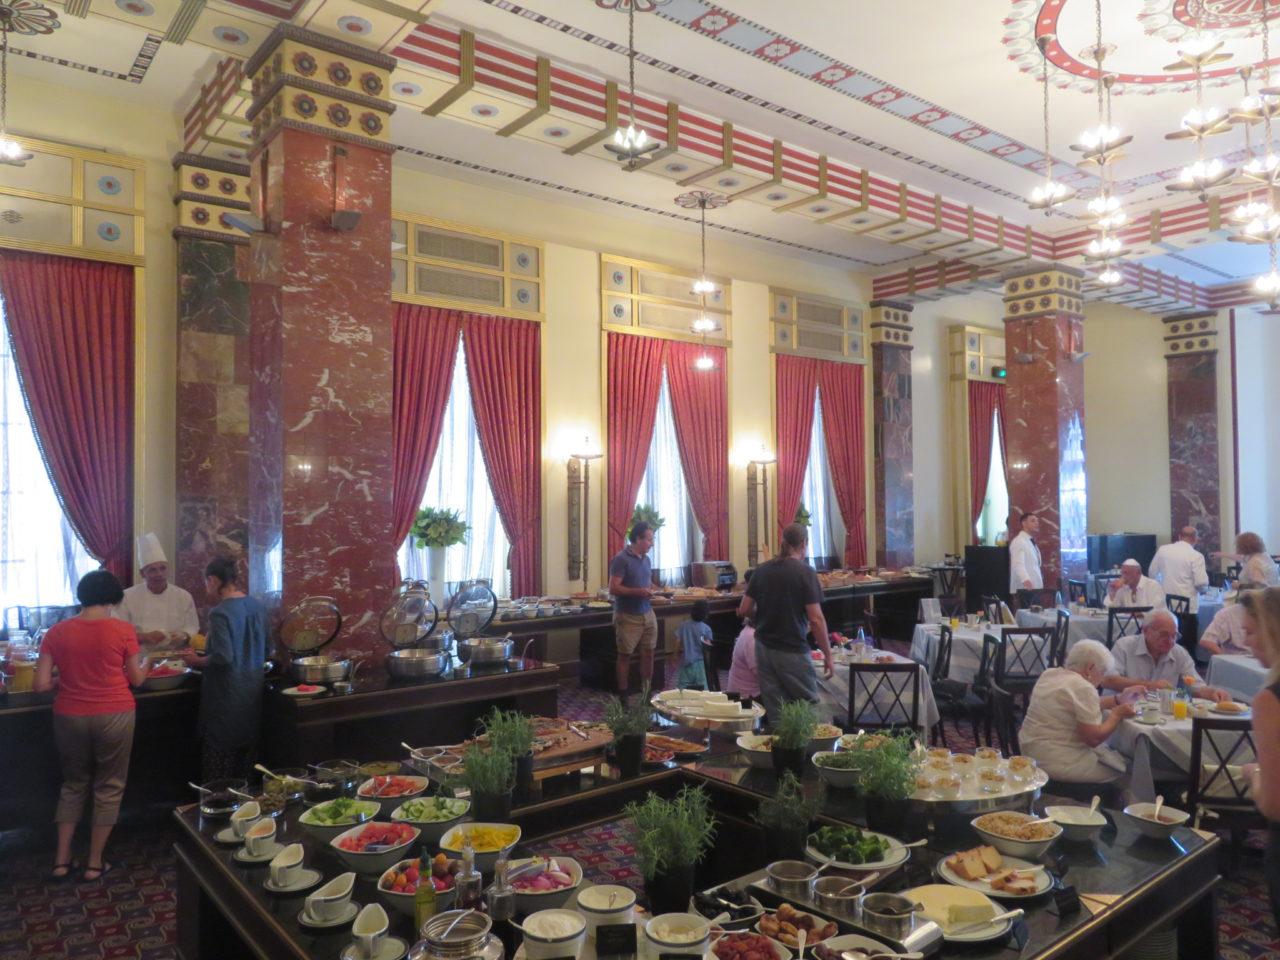 King David Hotel, Jerusalem Israel - Breakfast Buffet in President's Hall